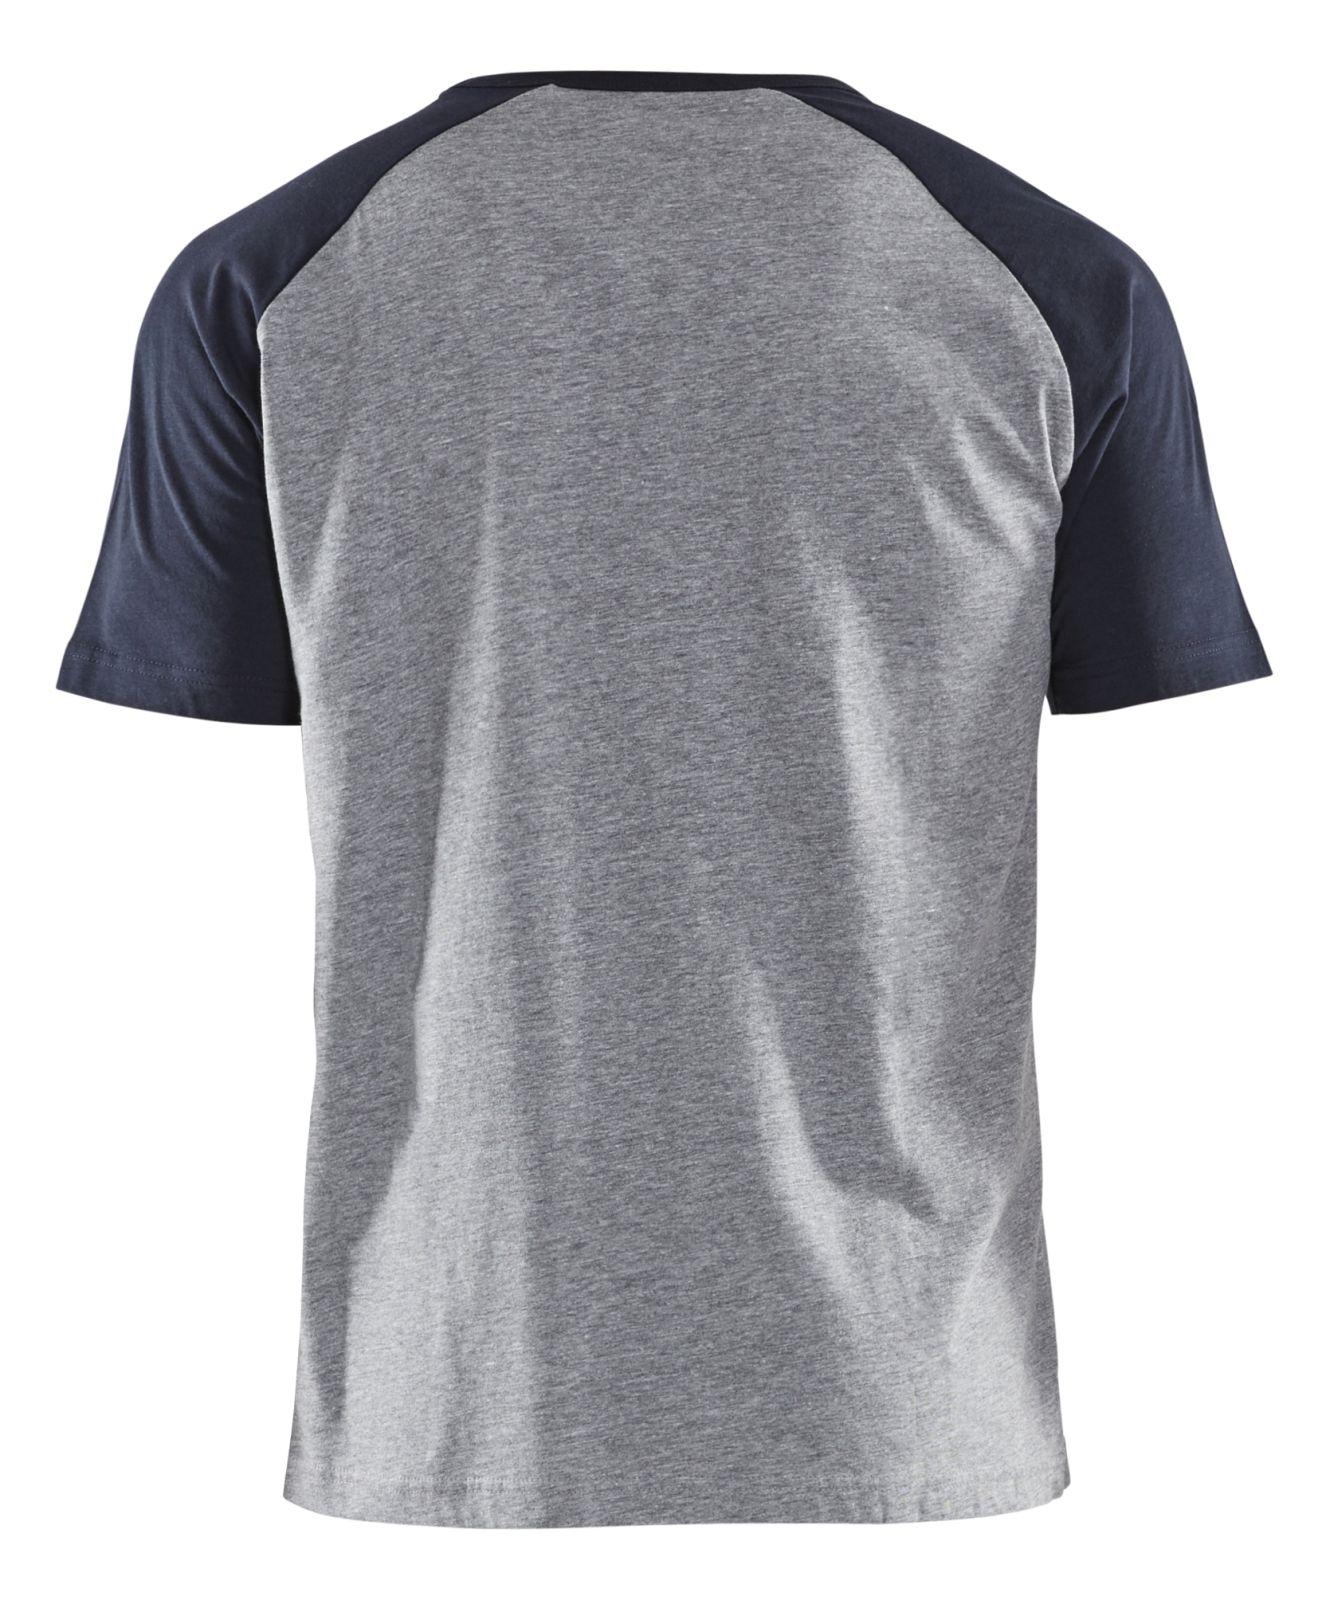 Blaklader T-shirts 94041043 grijs melee-donkerblauw(9086)